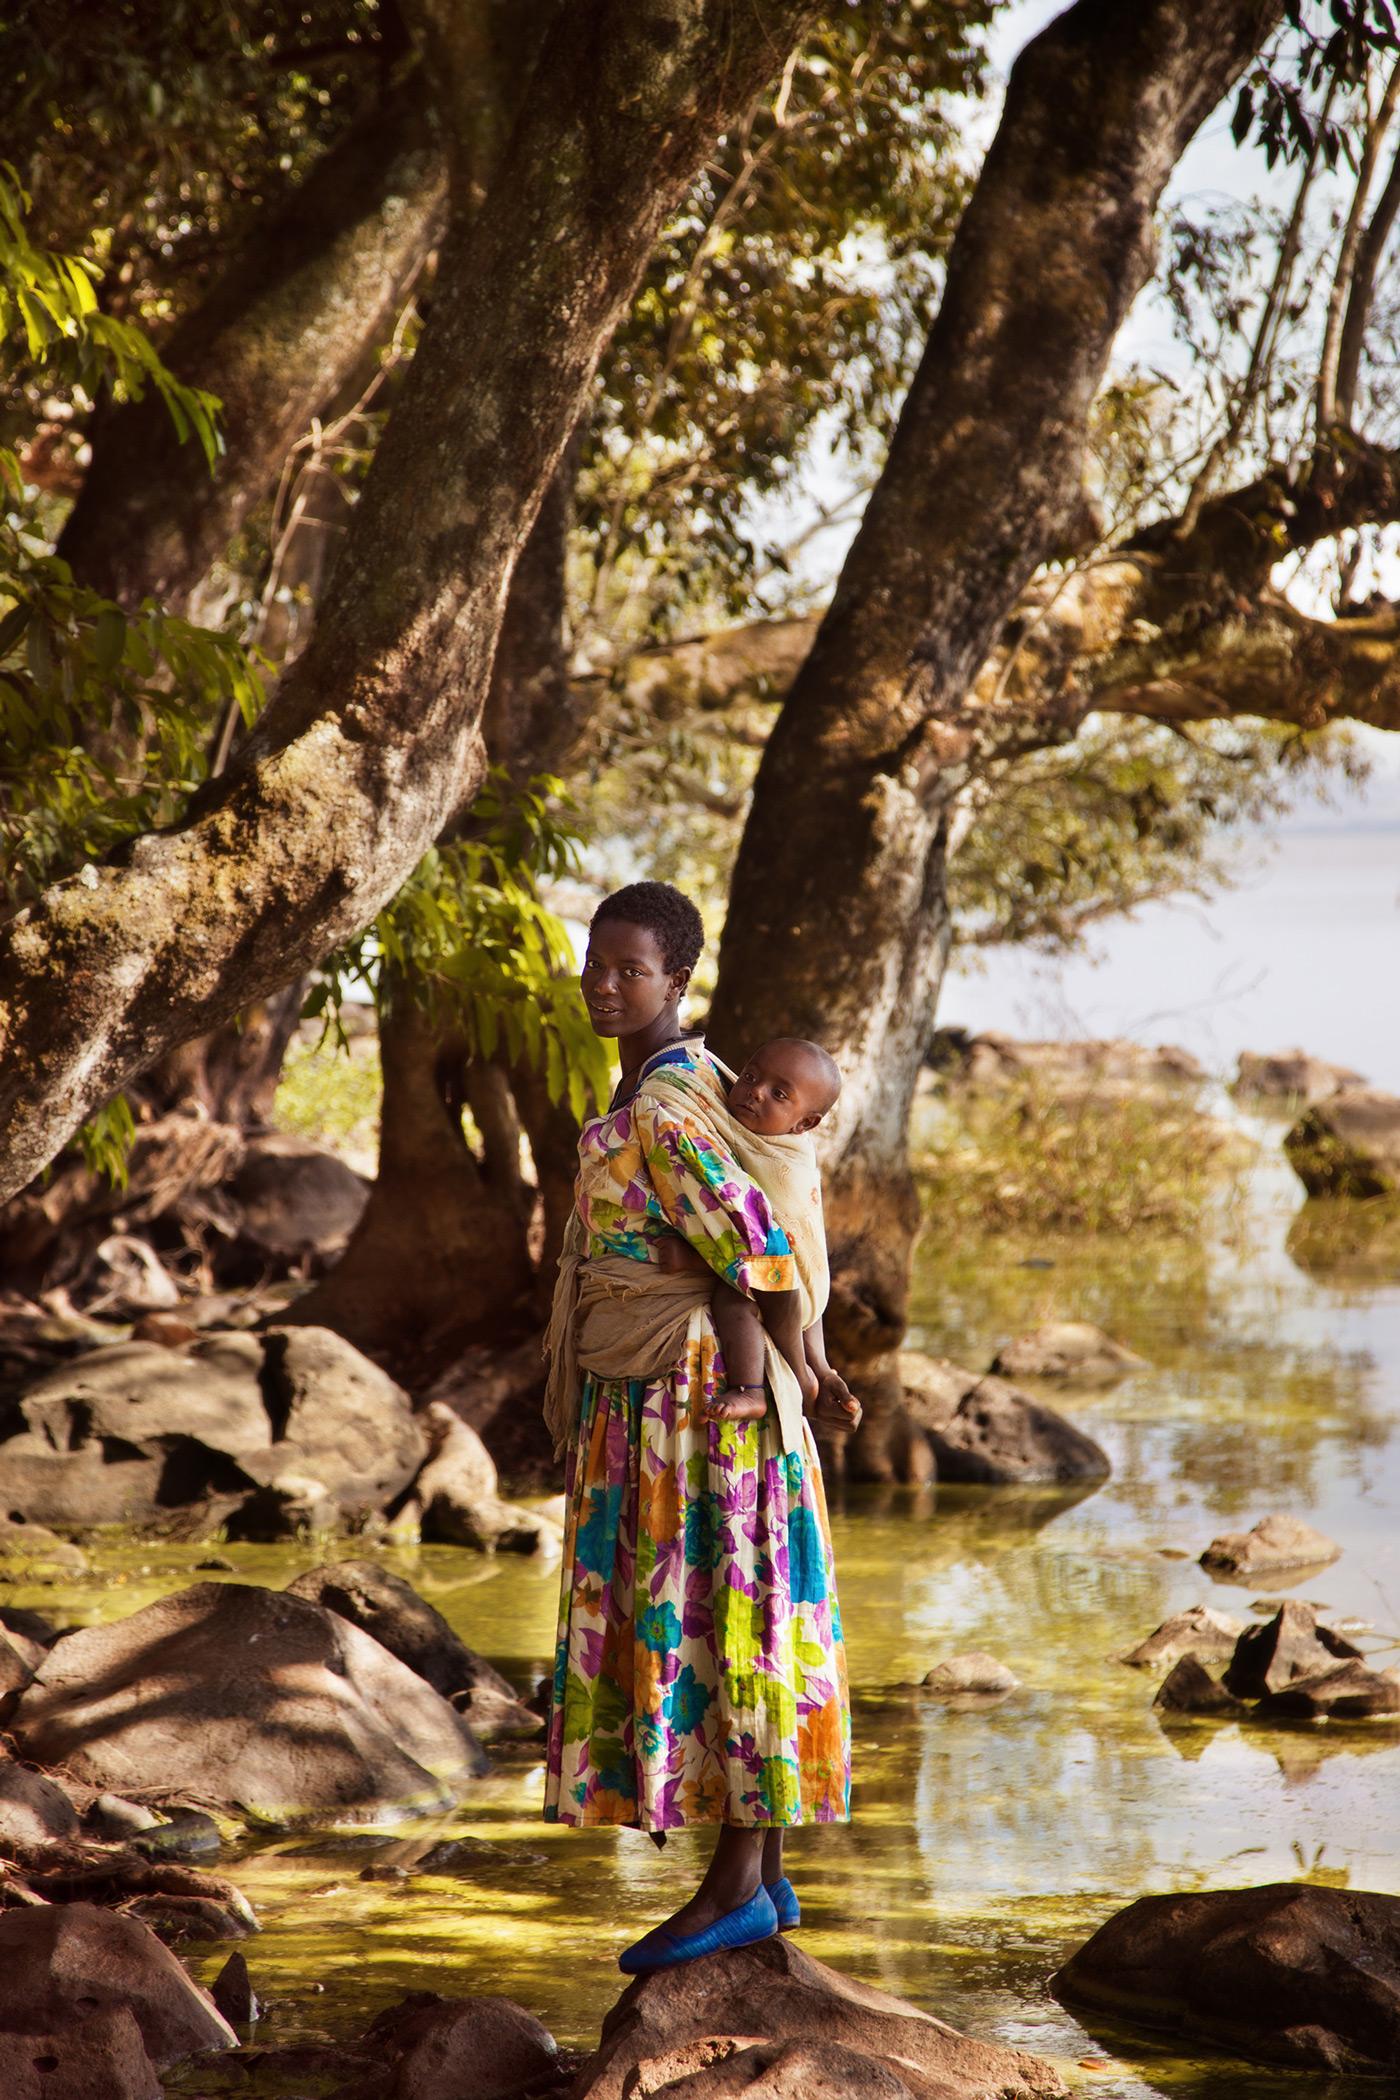 Atlas of Beauty: Mutter mit Kind in Äthopien // HIMBEER